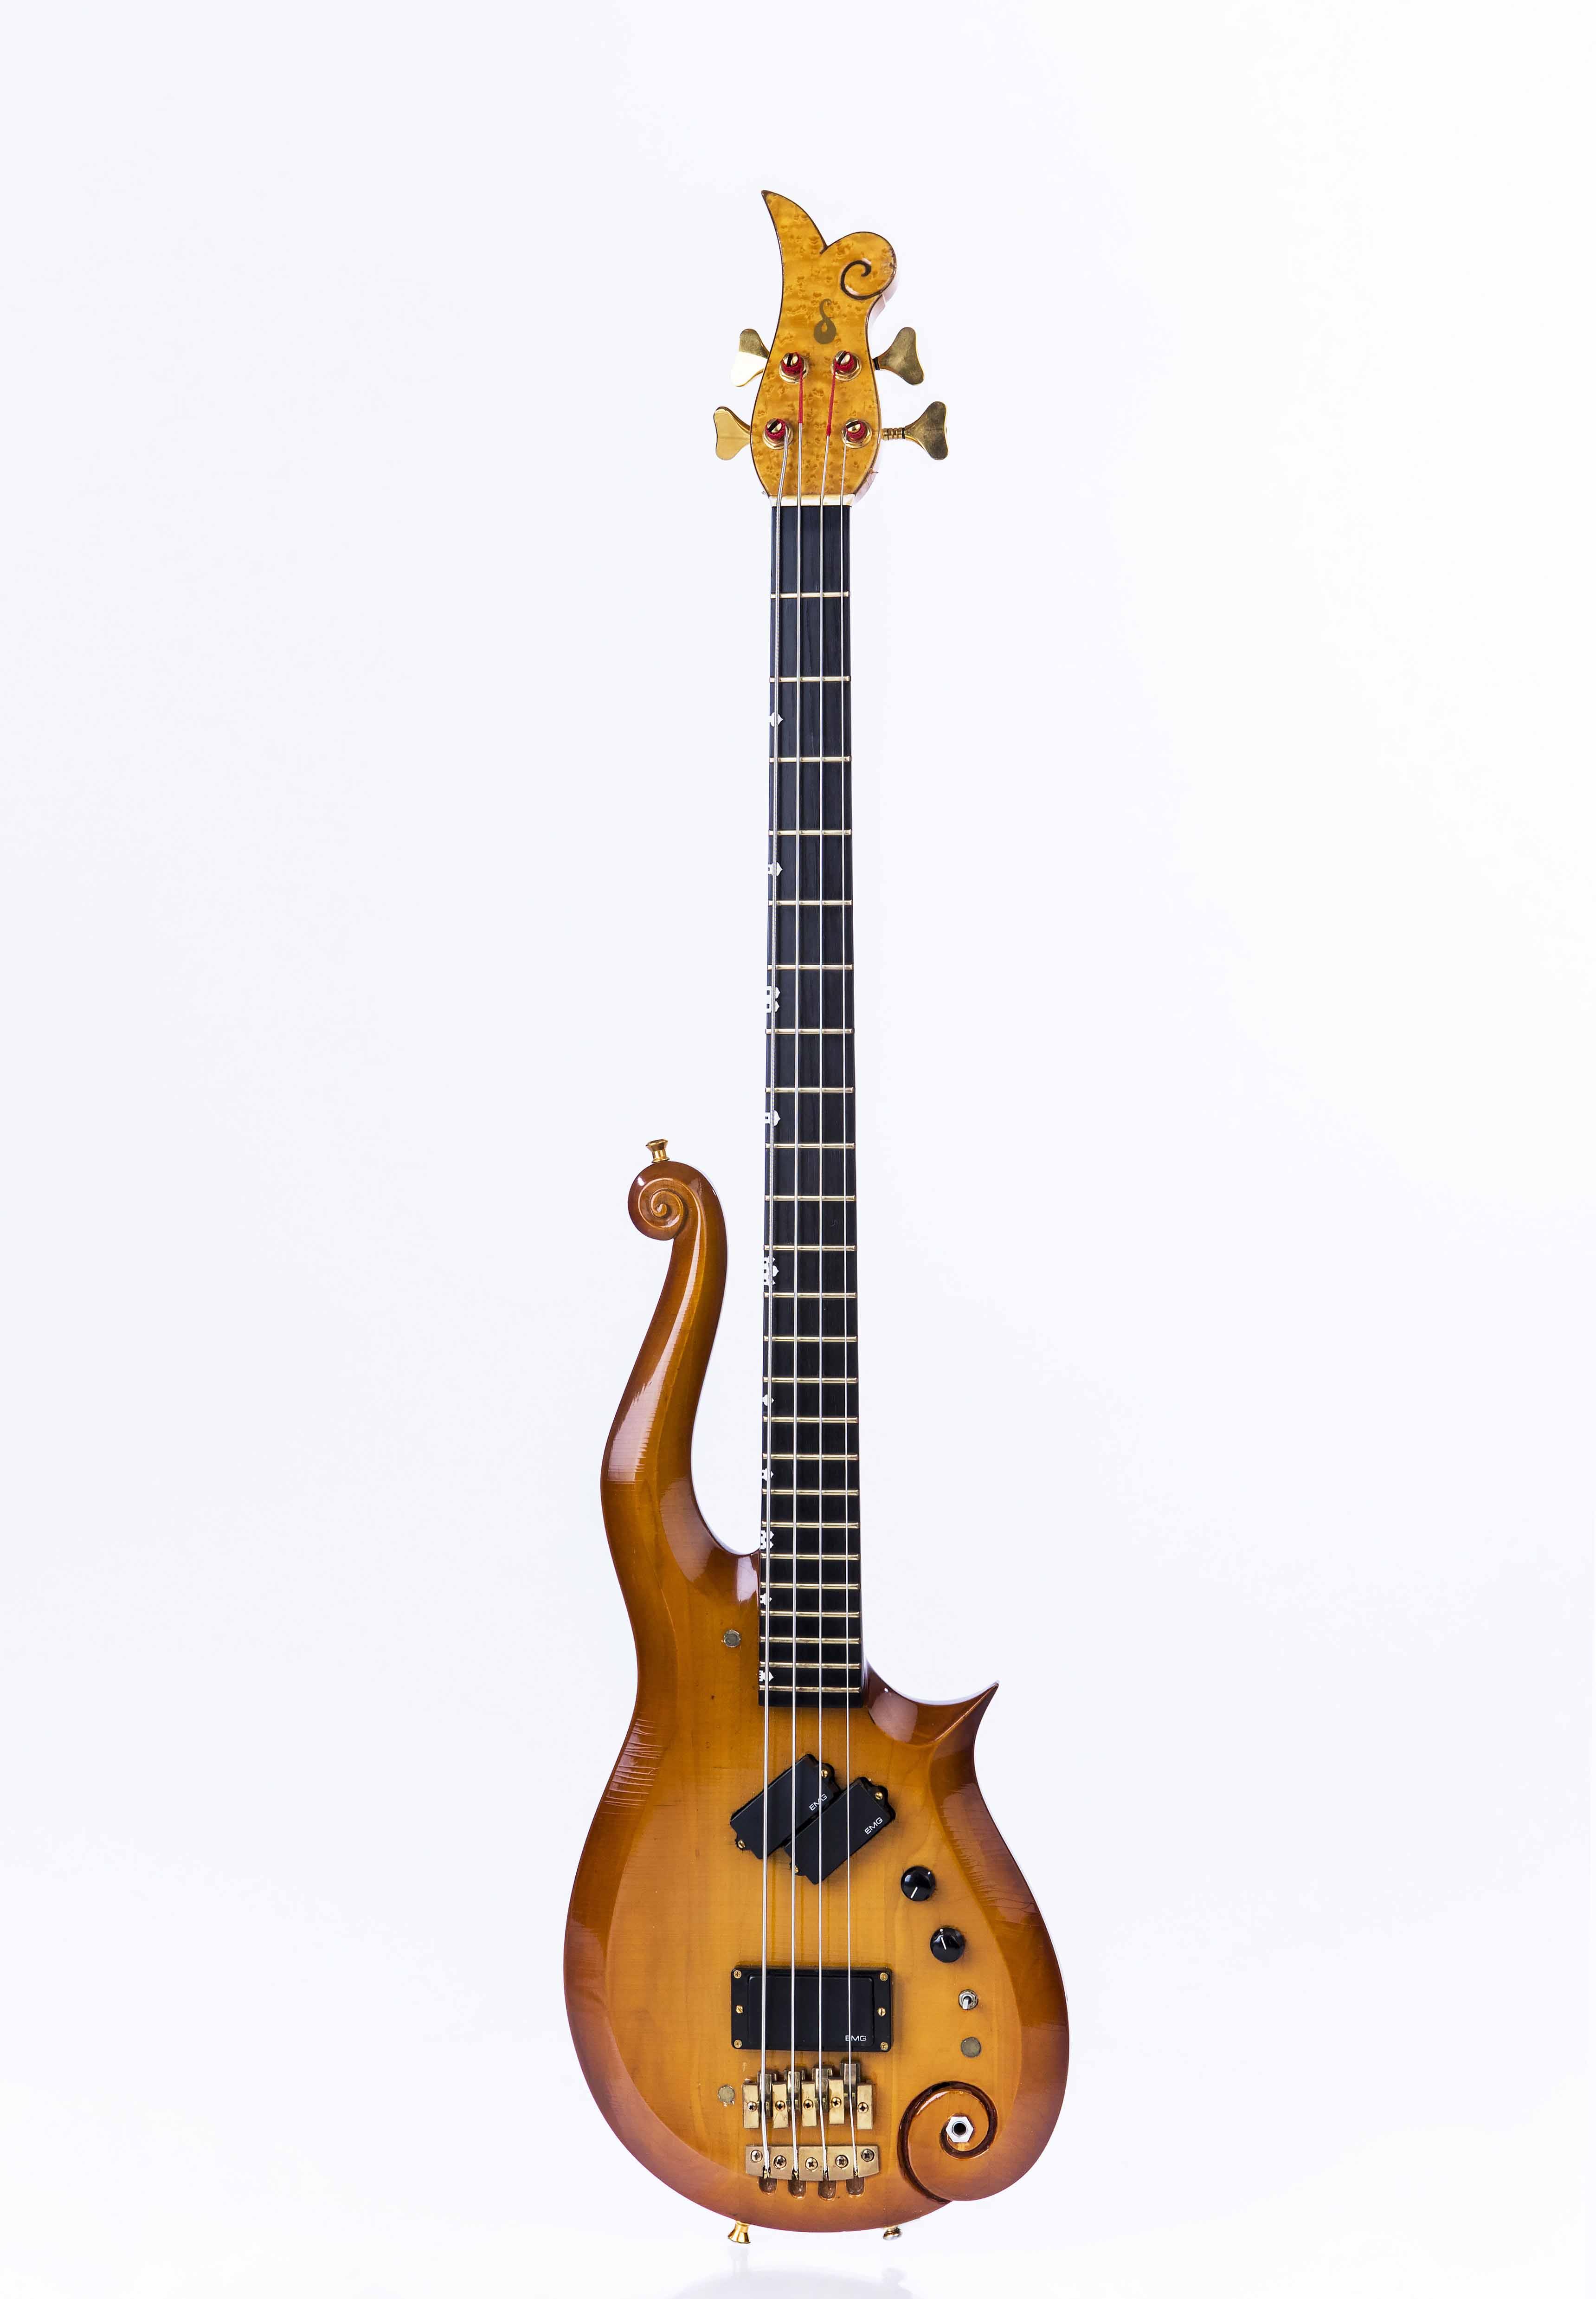 Basse Cloud  - La basse originale qui inspira la guitare cloud